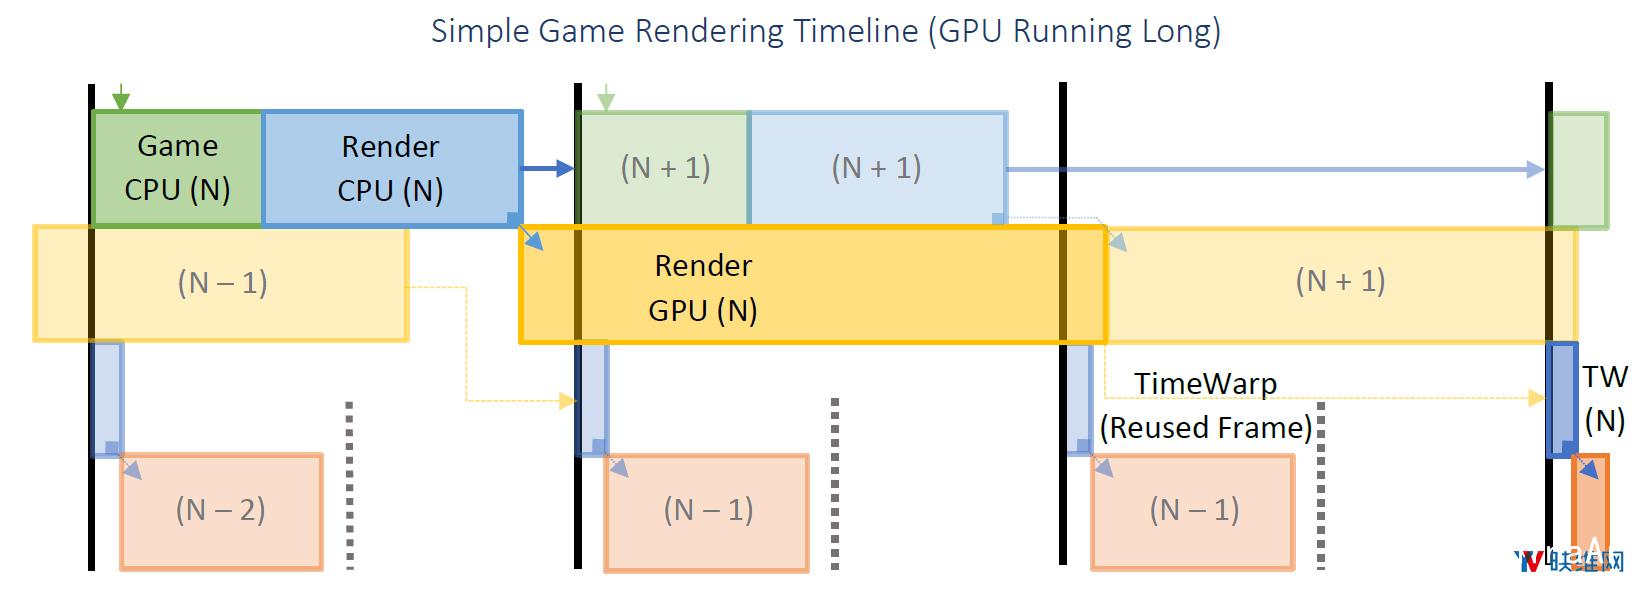 Oculus详述『延迟』问题及对应『帧渲染』解决方案 资源教程 第6张